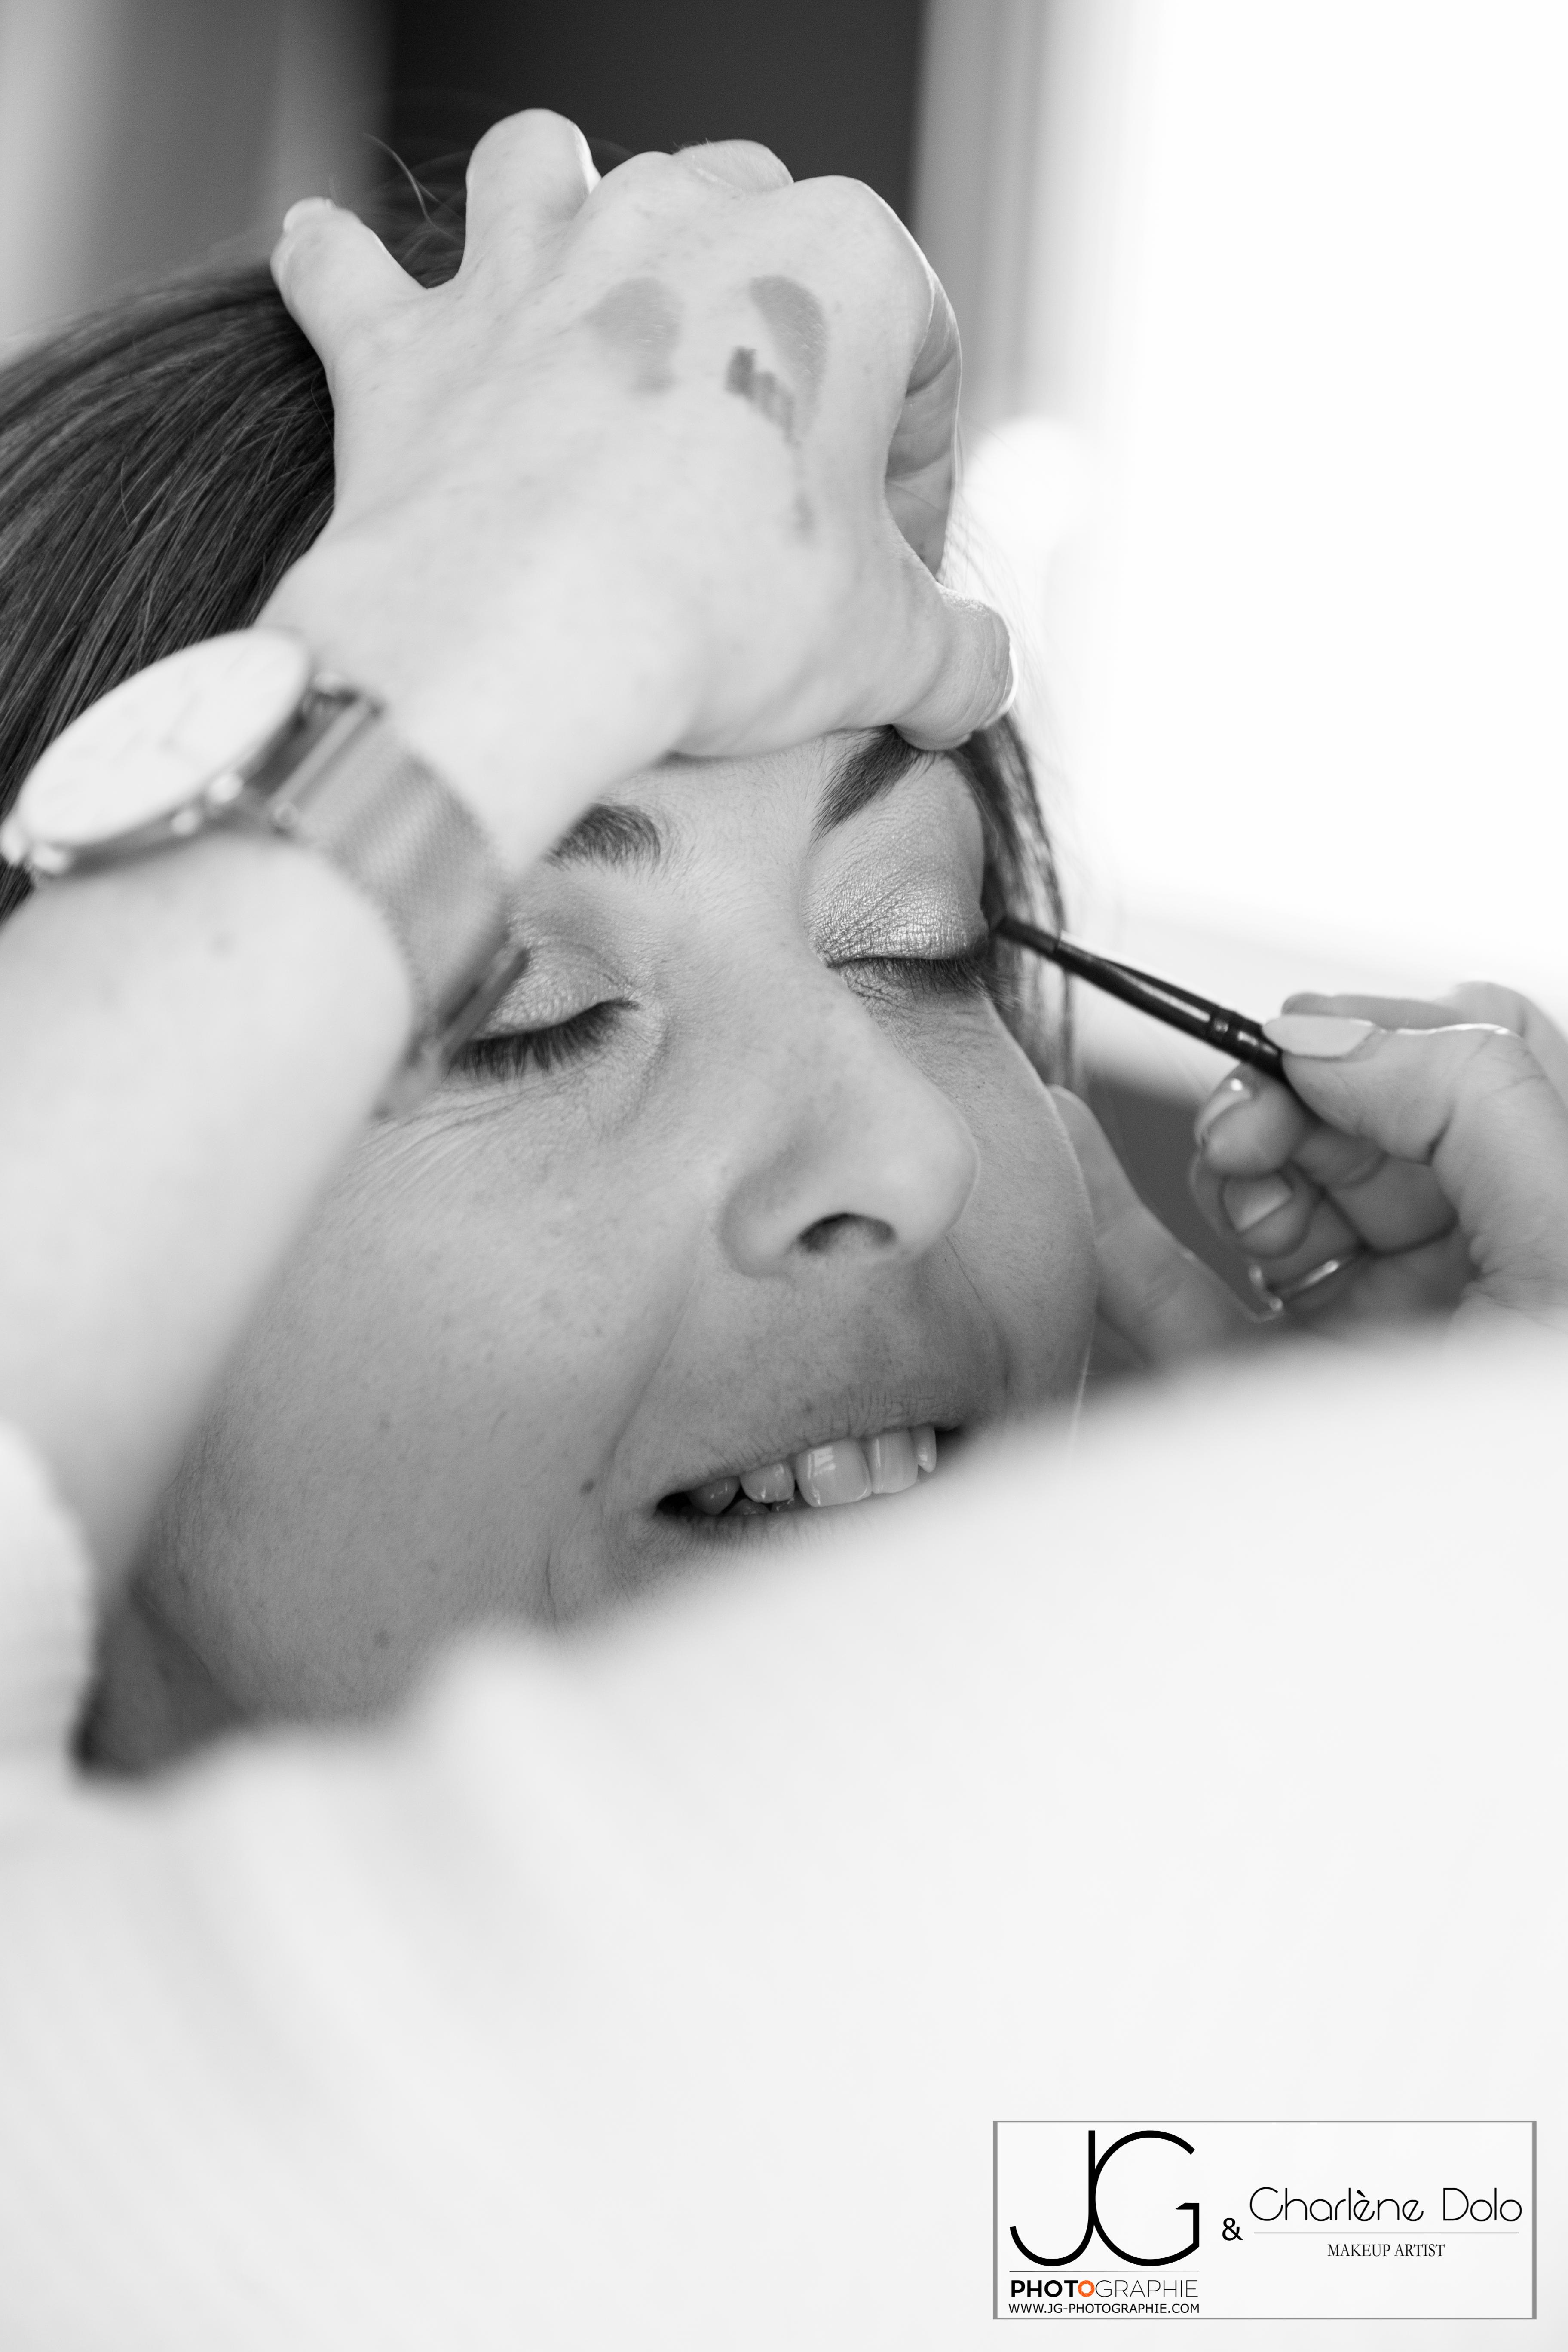 Séance Maquillage pour shooting